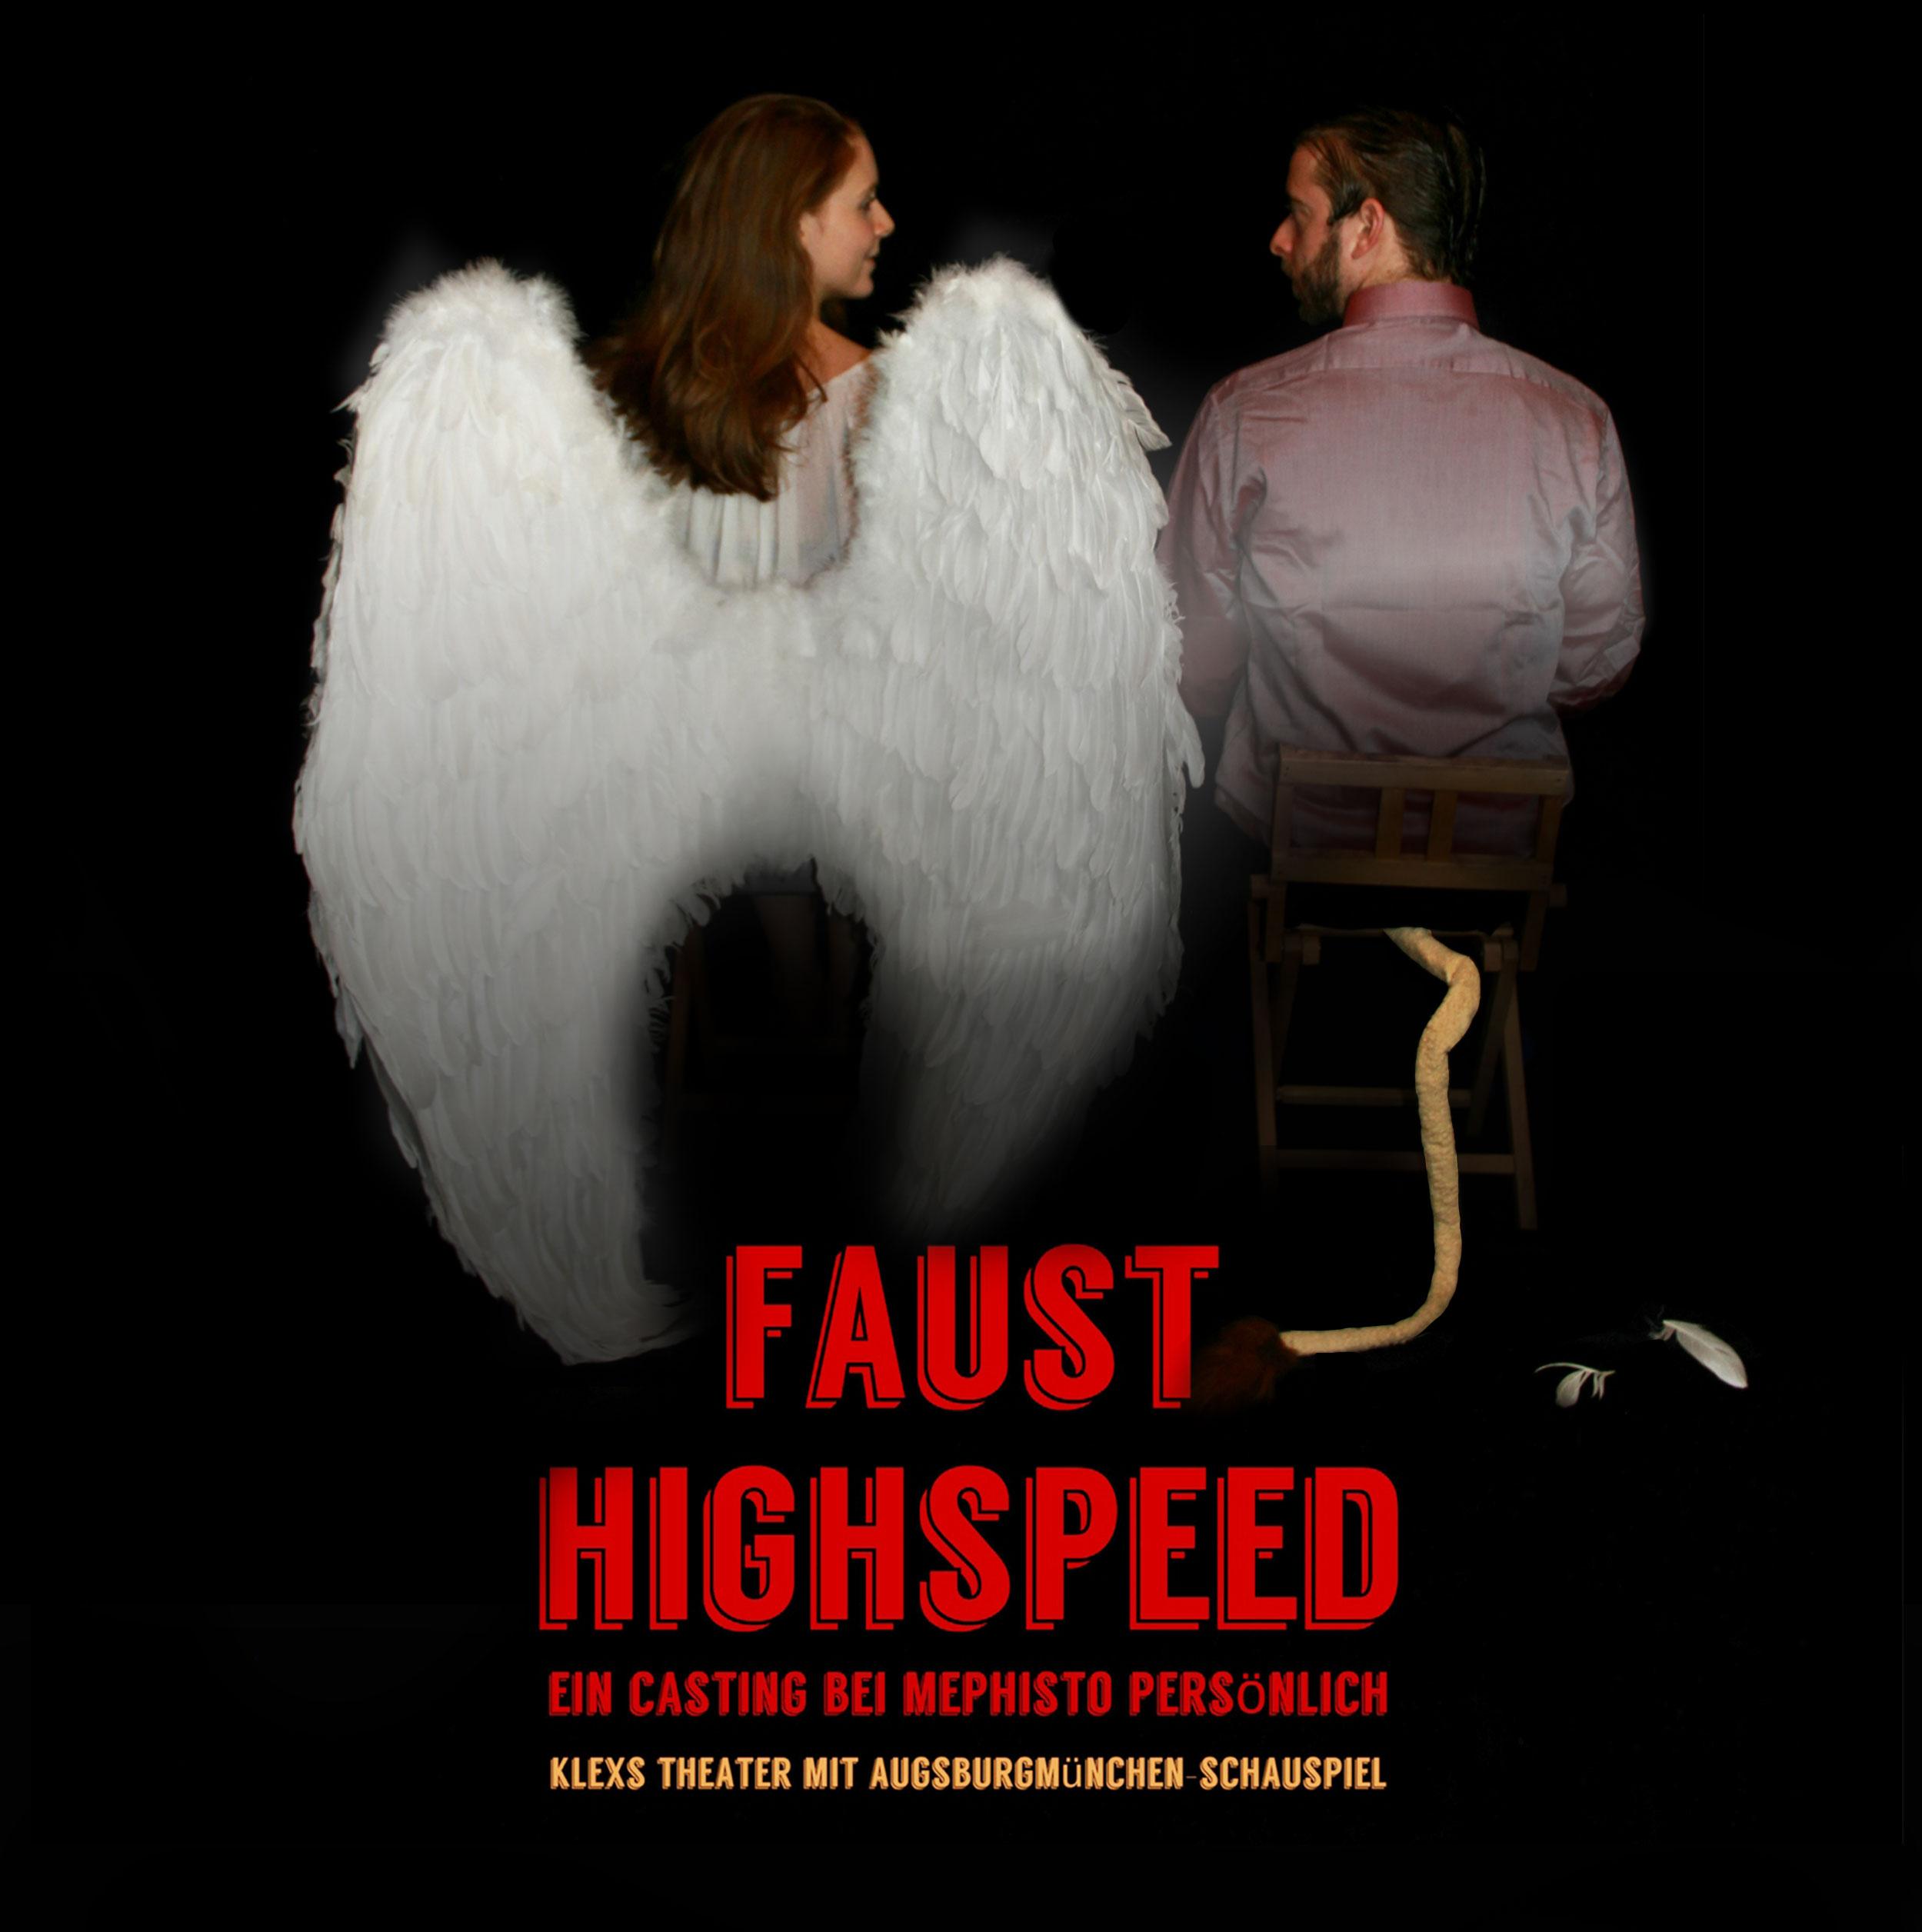 Faust Highspeed – Mephistos Casting